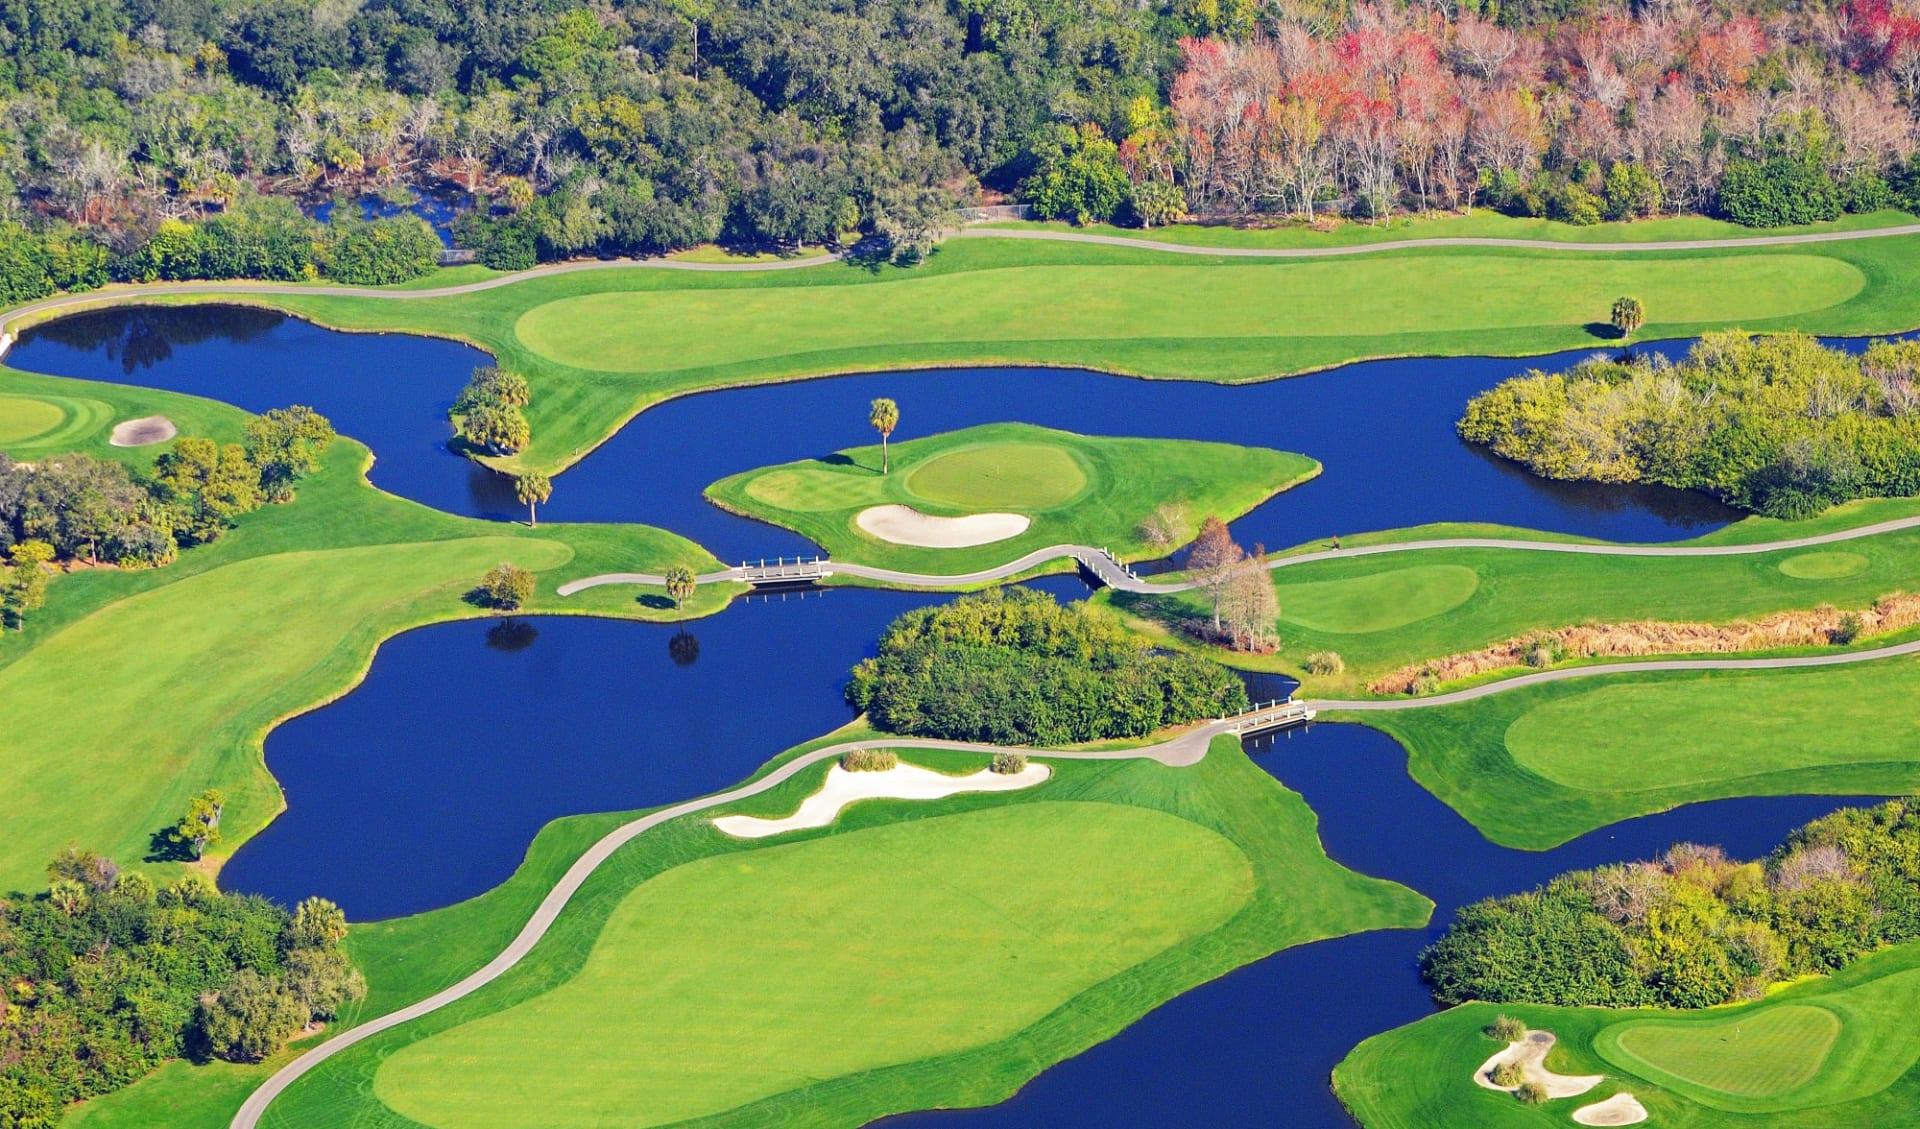 Salamander Spa & Golf Resort Innisbrook in Tampa: Salamander Spa & Golf Resort Innsibrook - North Course